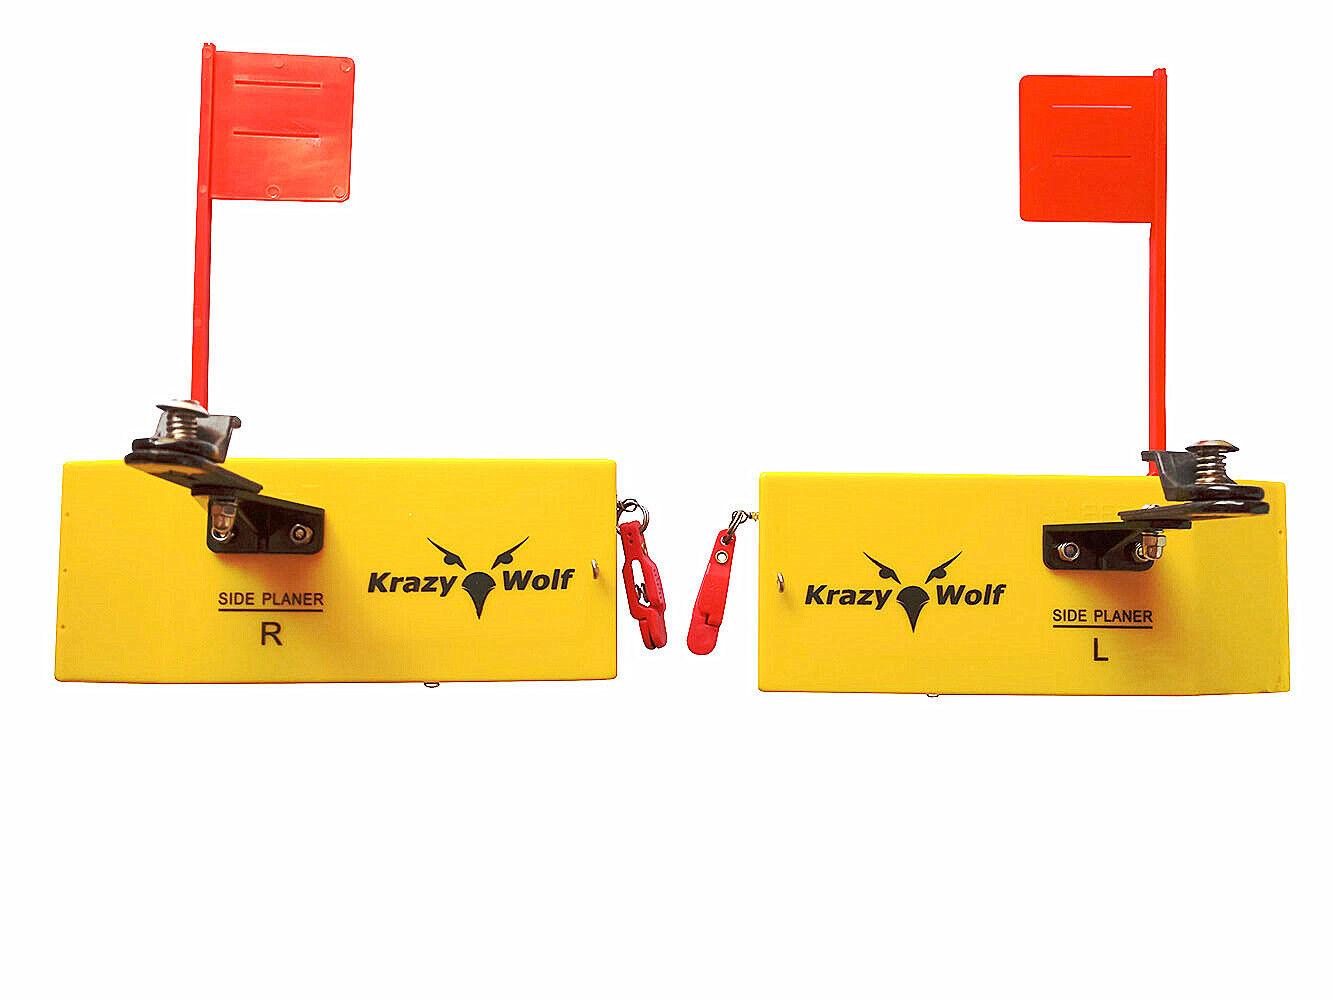 2Pcs Planer Board Spring Flag  system Left&Right,Medium,L8 xW3  similar opti  sell like hot cakes